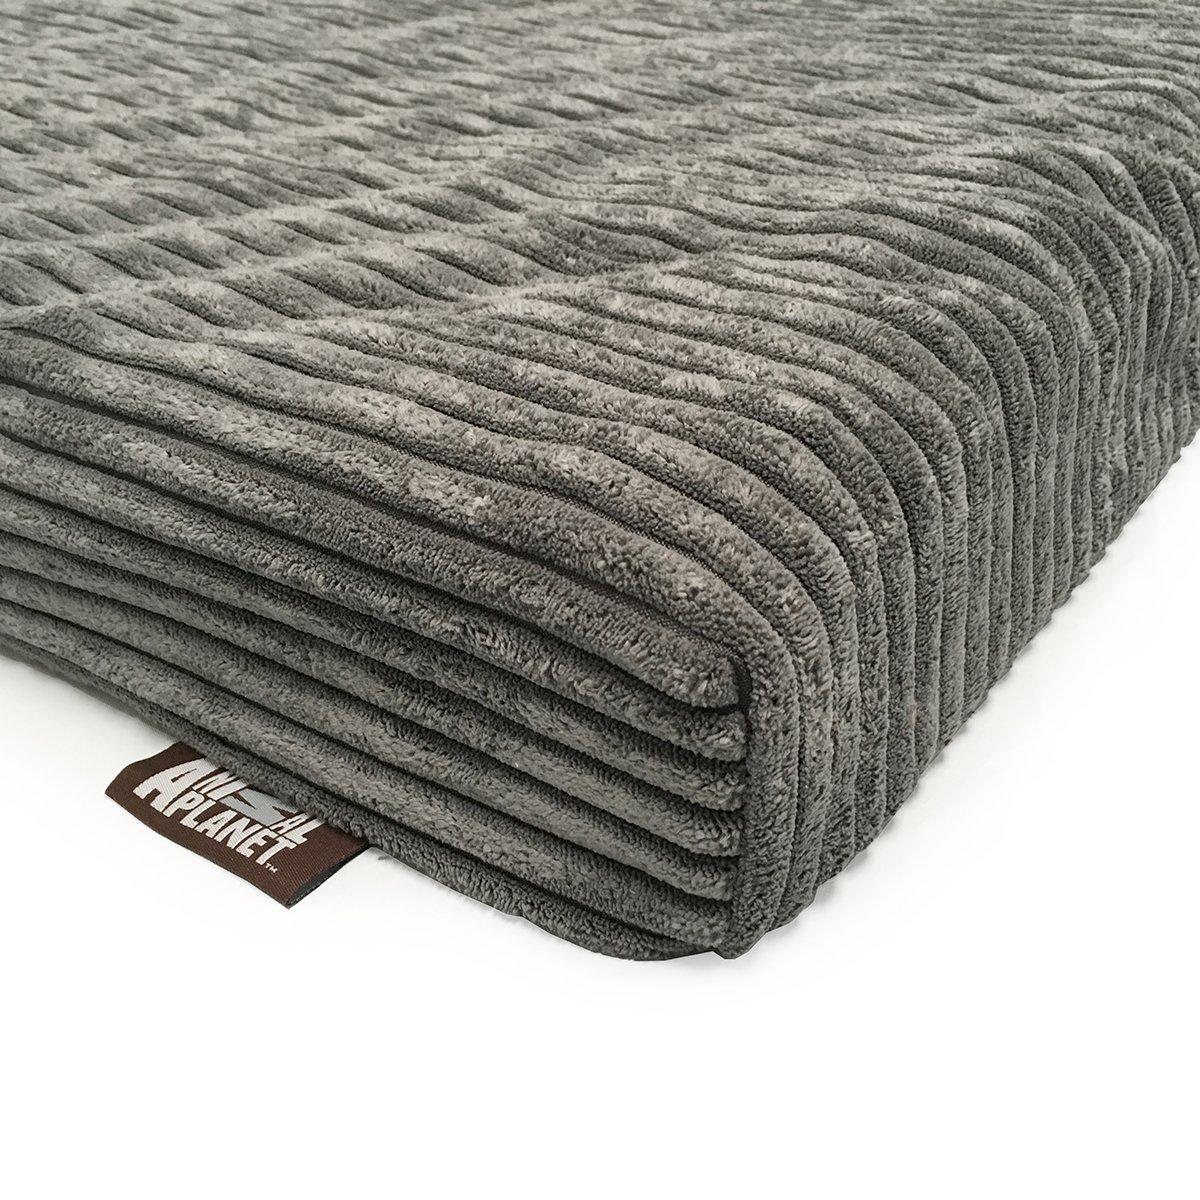 Animal Planet Orthopedic Pet Bed, 40''x26''x3'', Grey by Animal Planet (Image #2)